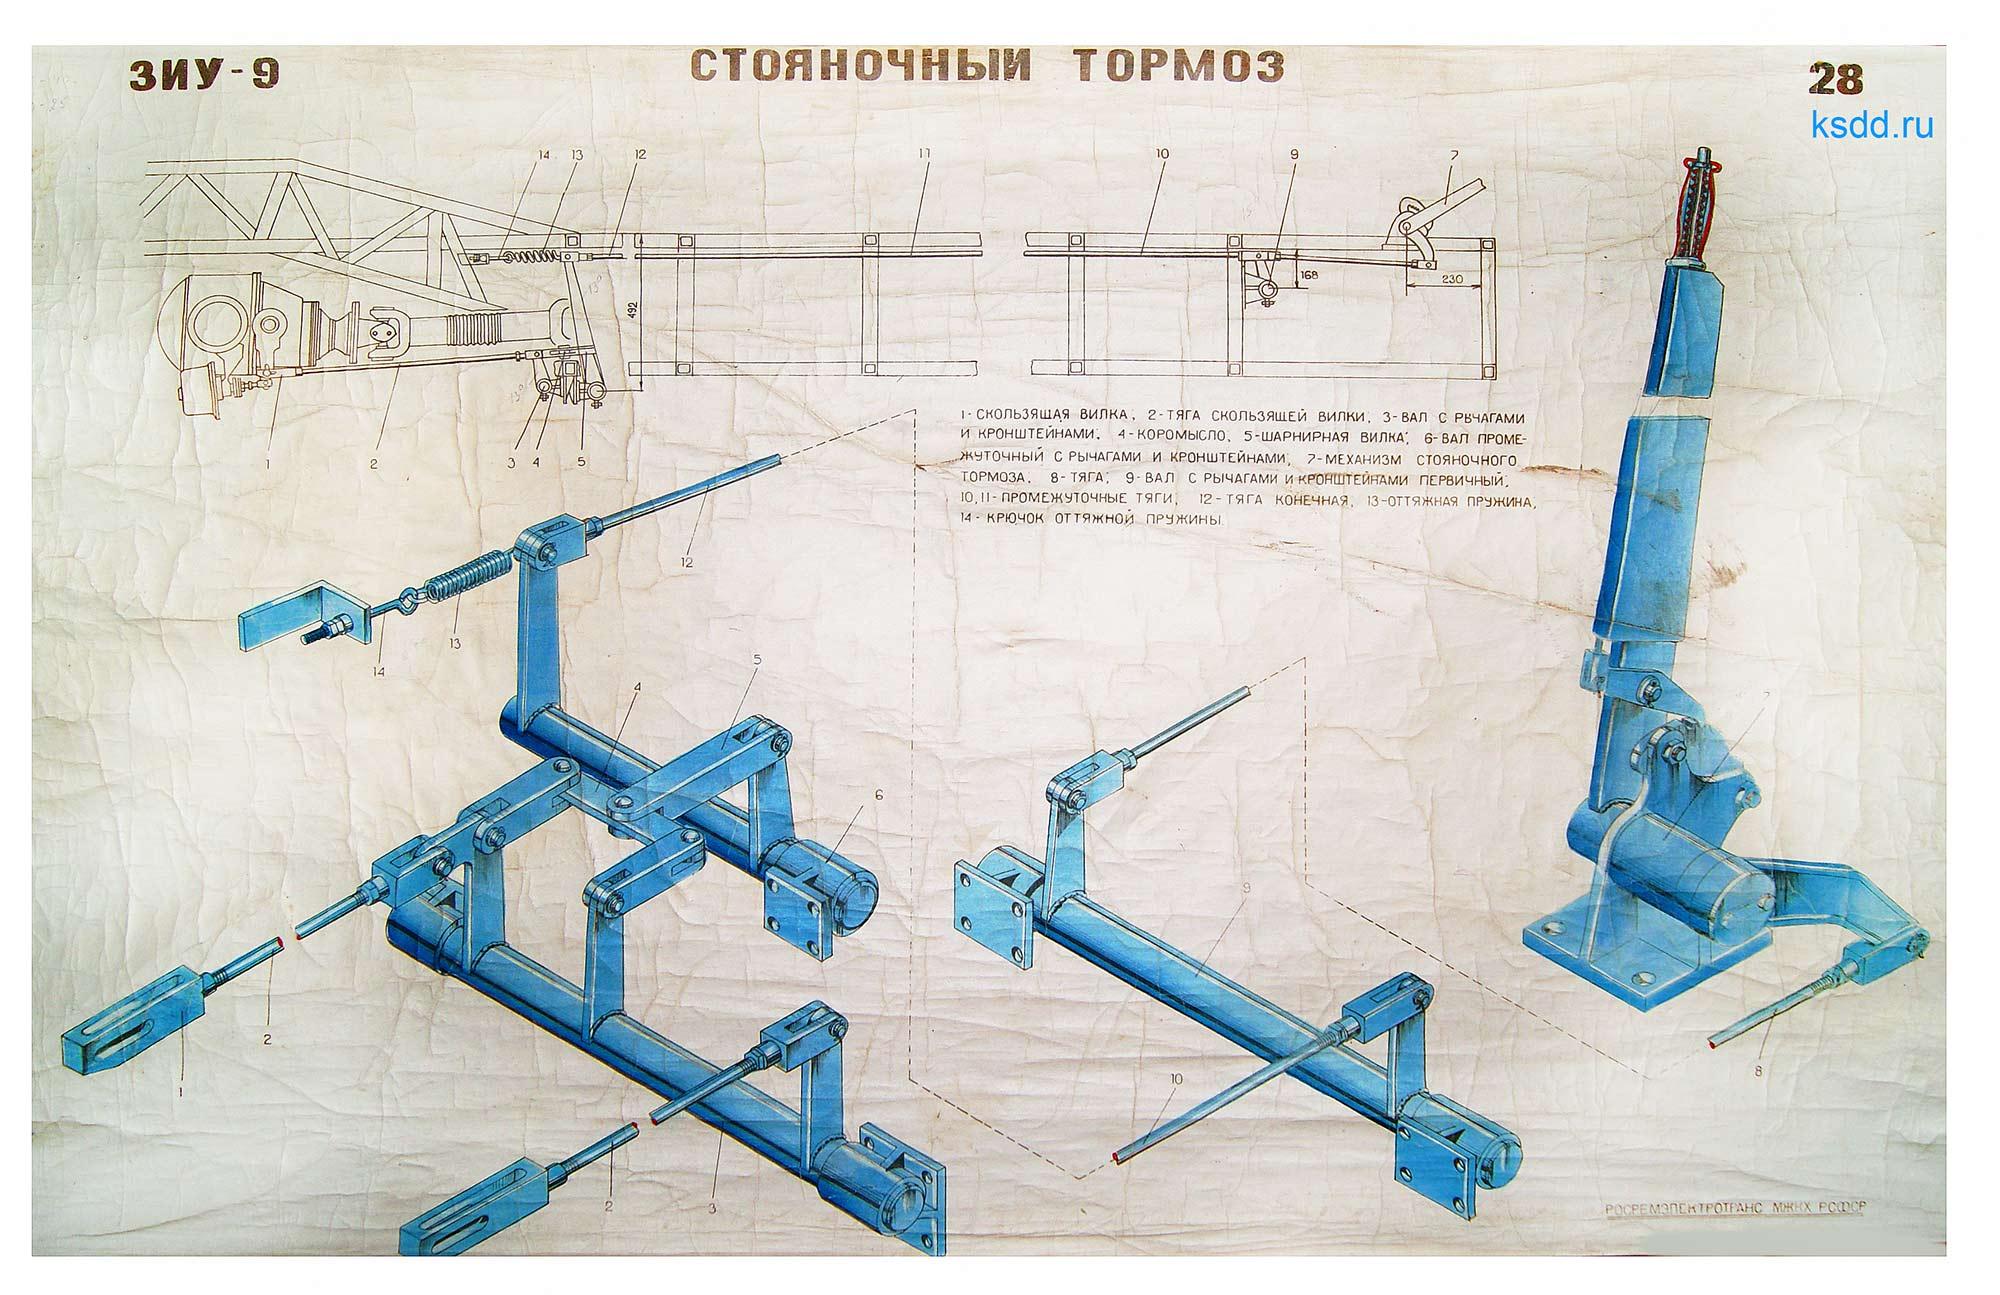 33.-Стояночный-тормоз-троллейбуса-ЗИУ-9